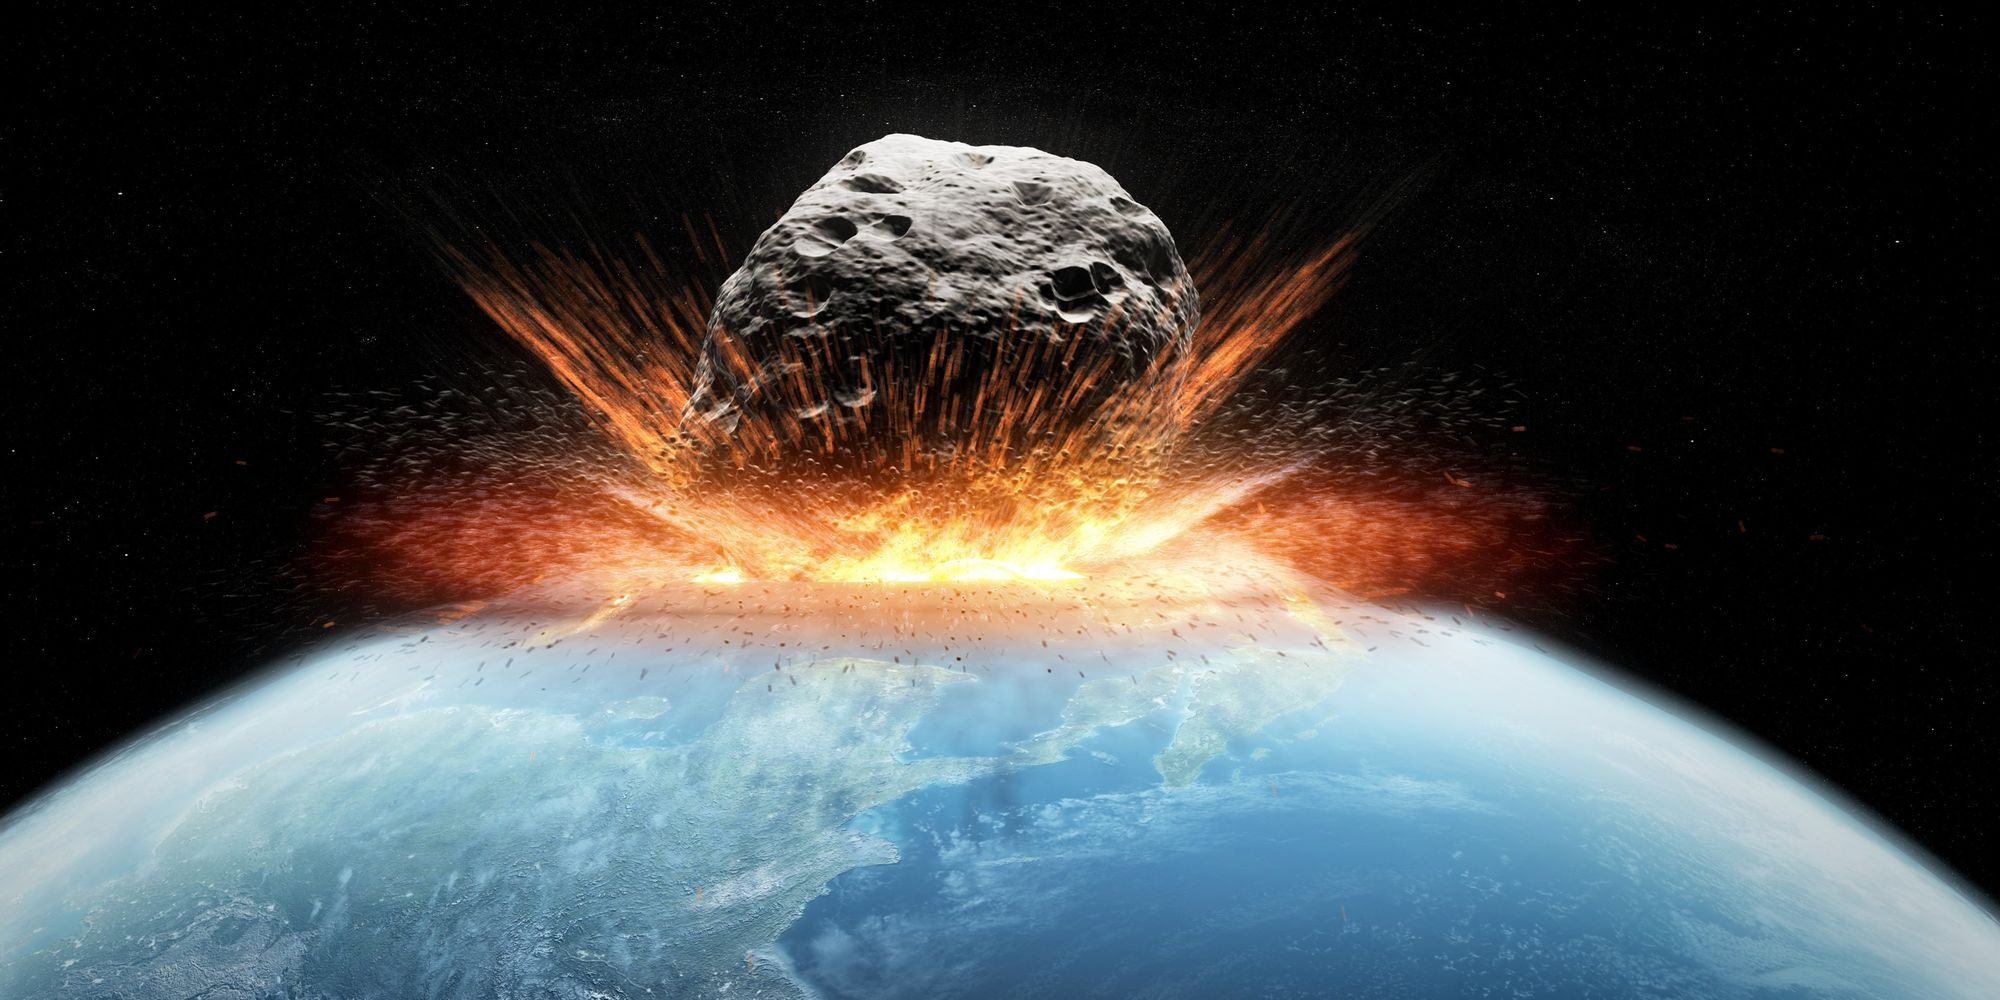 Ilustrasi Hantaman Asteroid ke Bumi